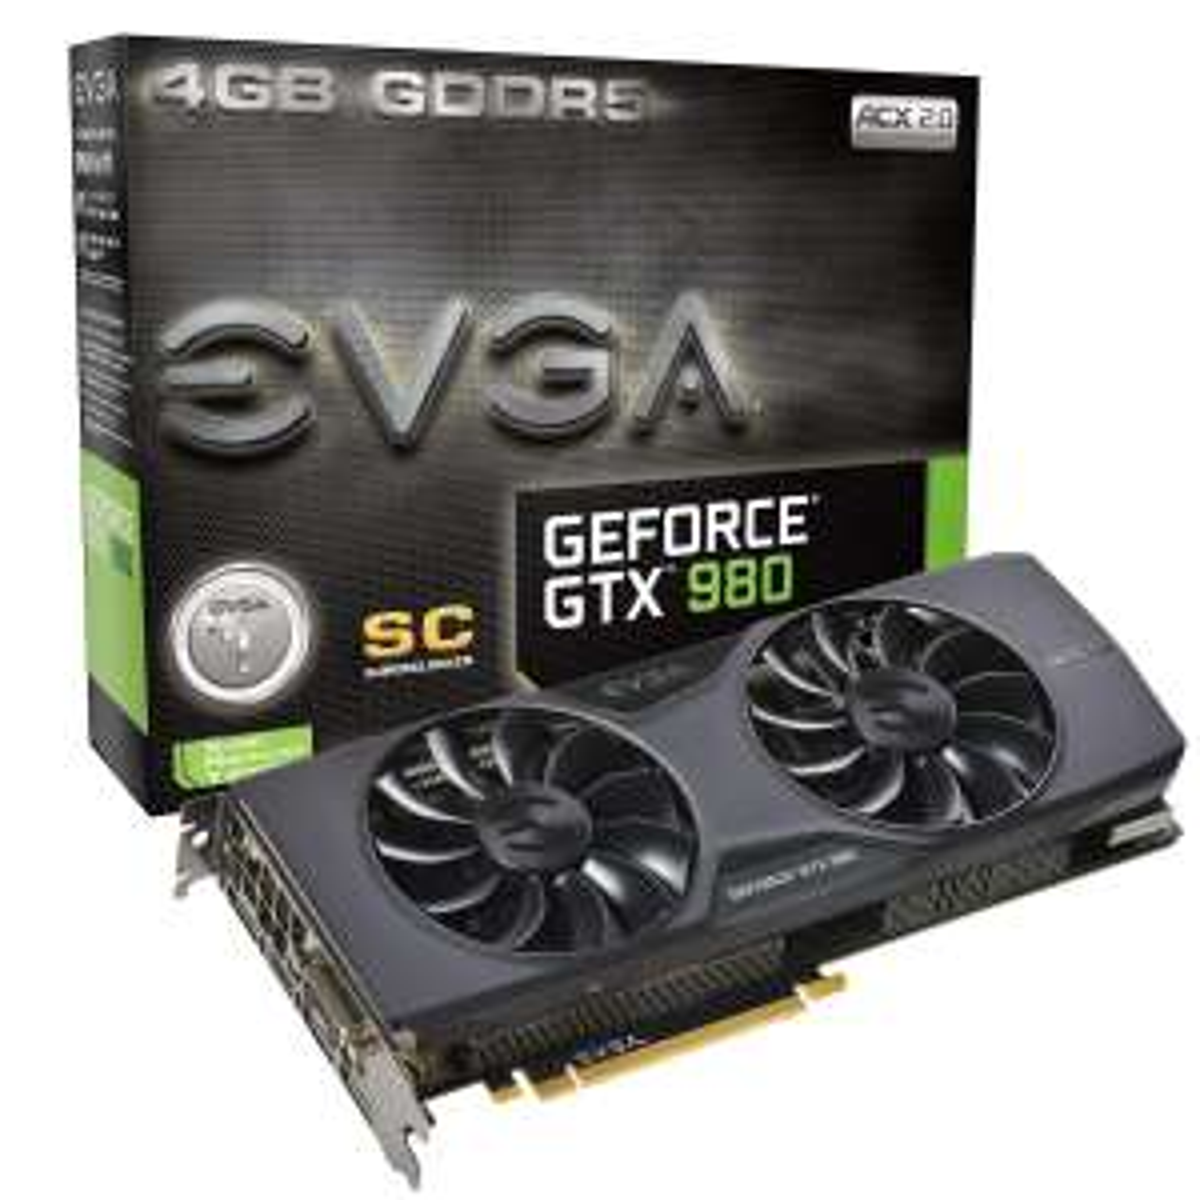 Carte graphique GeForce GTX 980 Superclocked ACX 2.0 - GDDR5, 4 Go